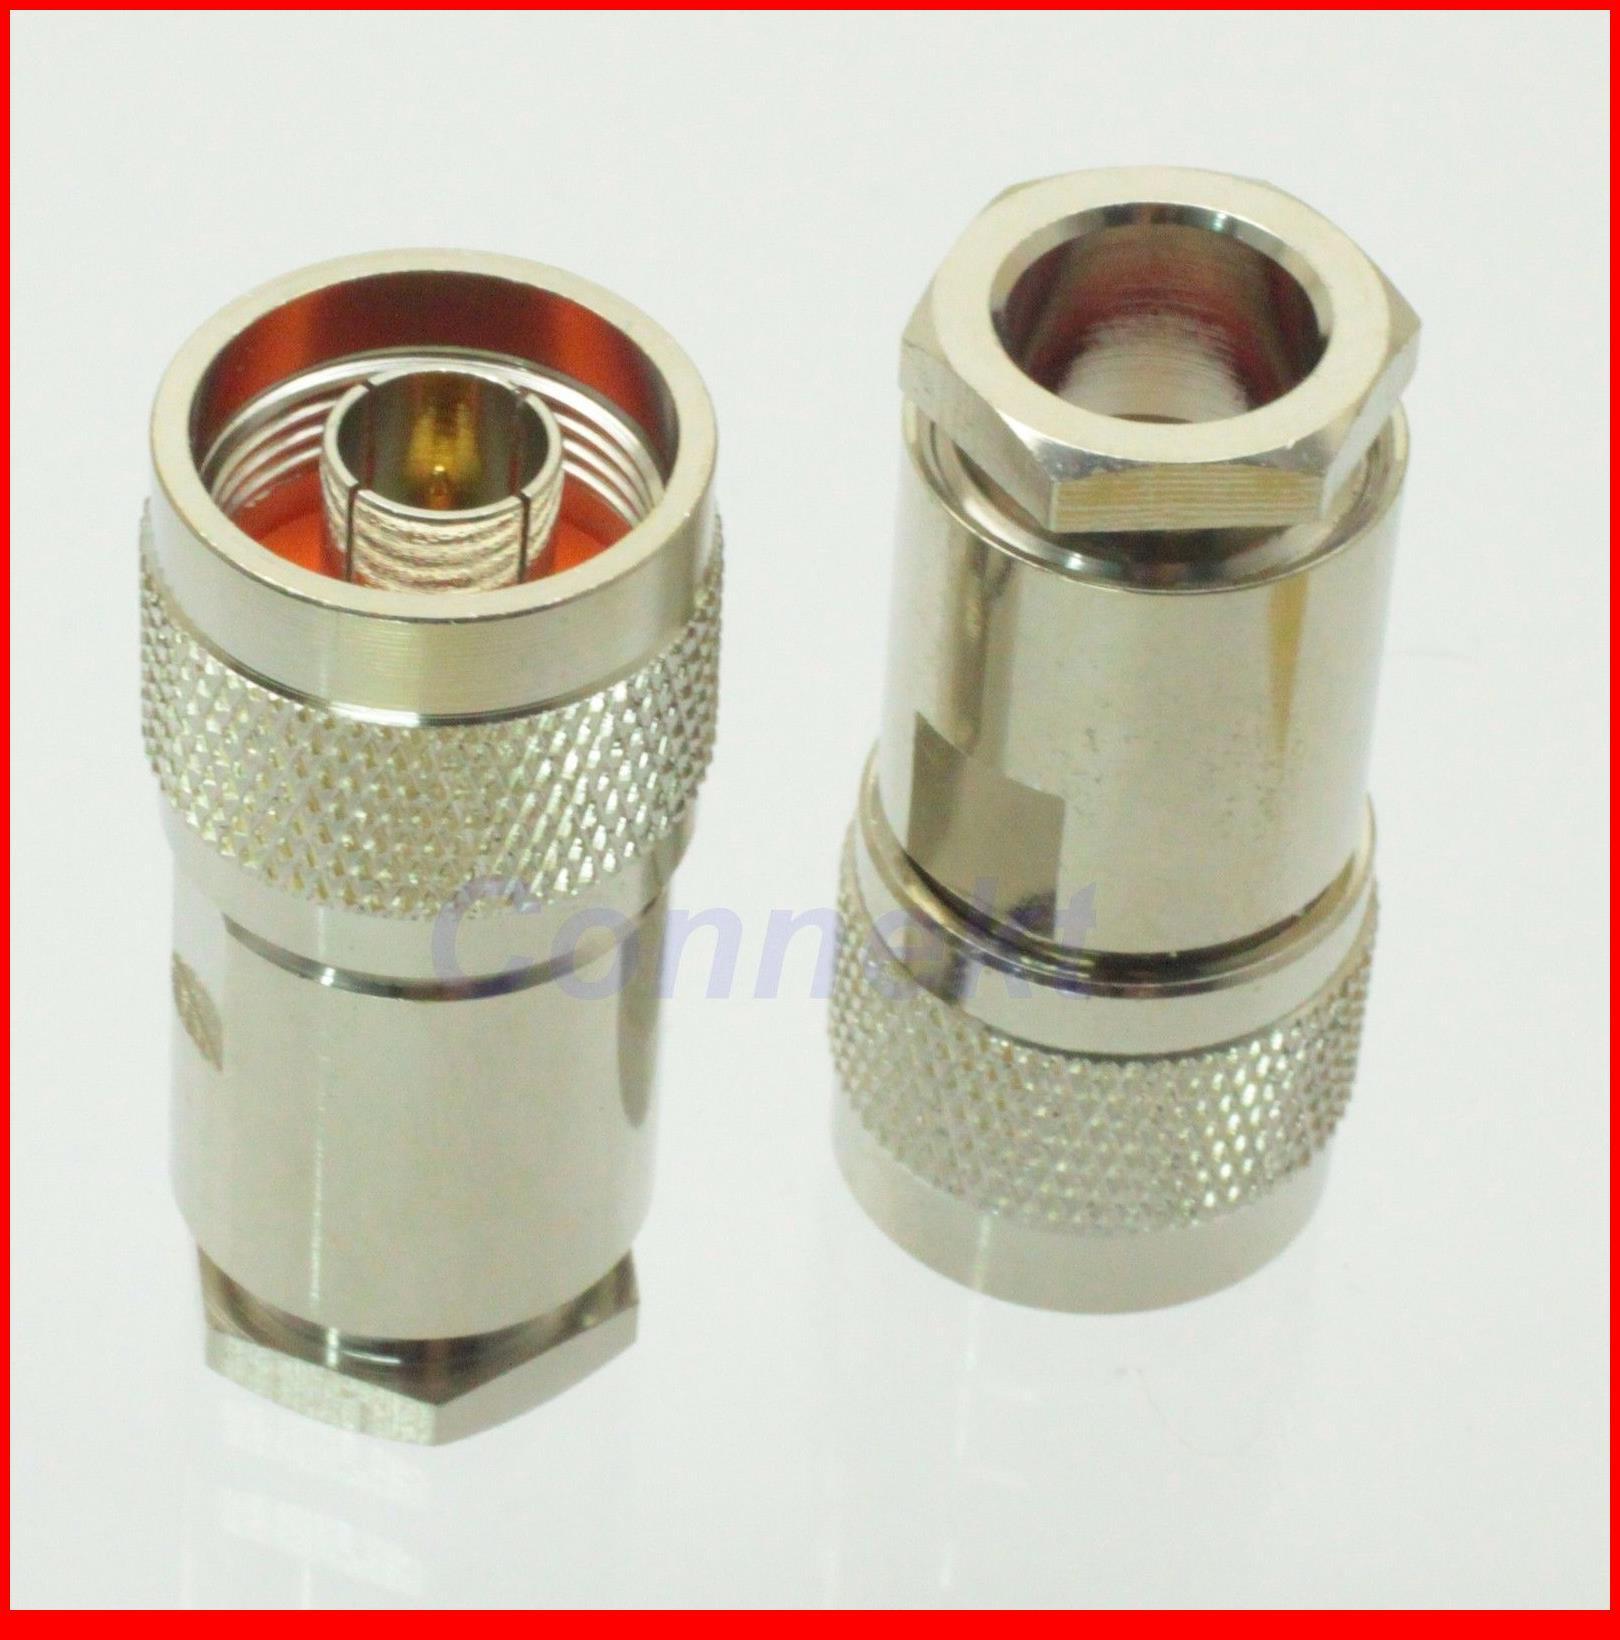 5 unids/lote N macho pinza RG11 RG12 RG144 RG216 conector de RF 75ohm